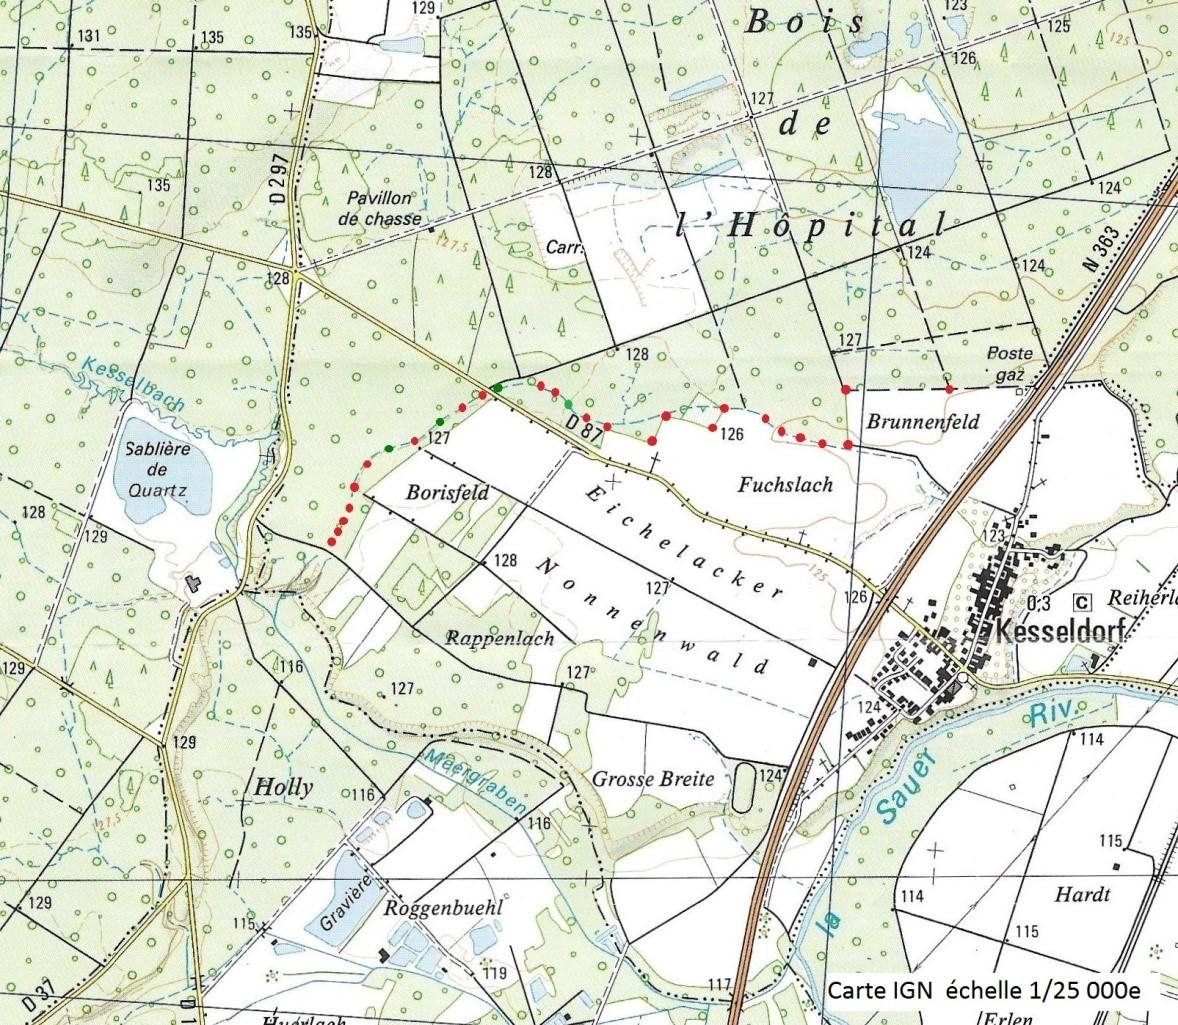 Ancien plan de Kesseldorf